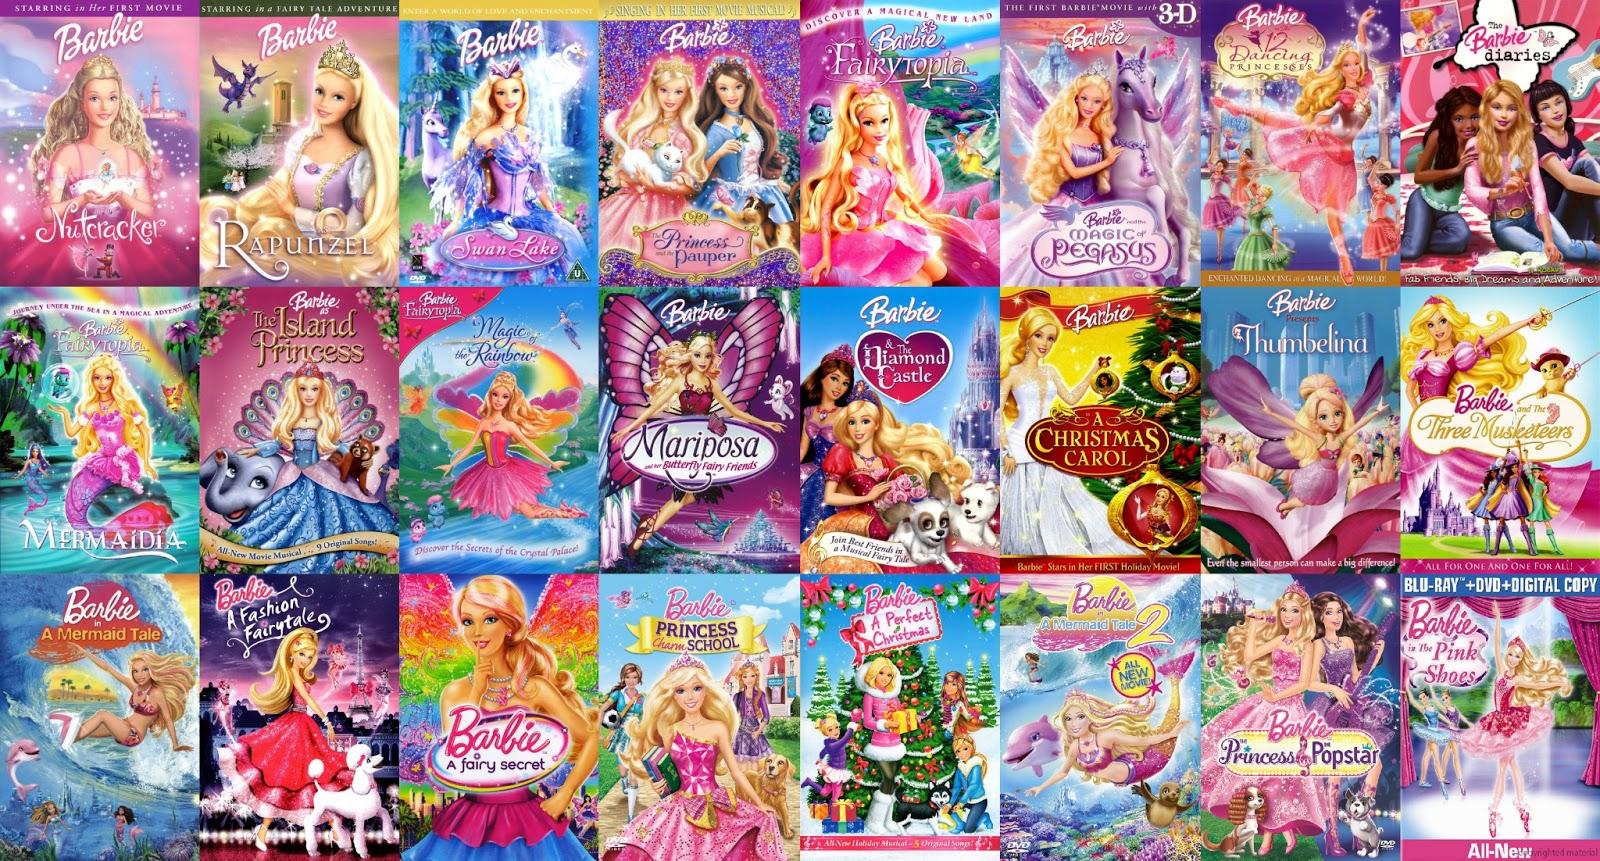 Barbie Film Series Filme